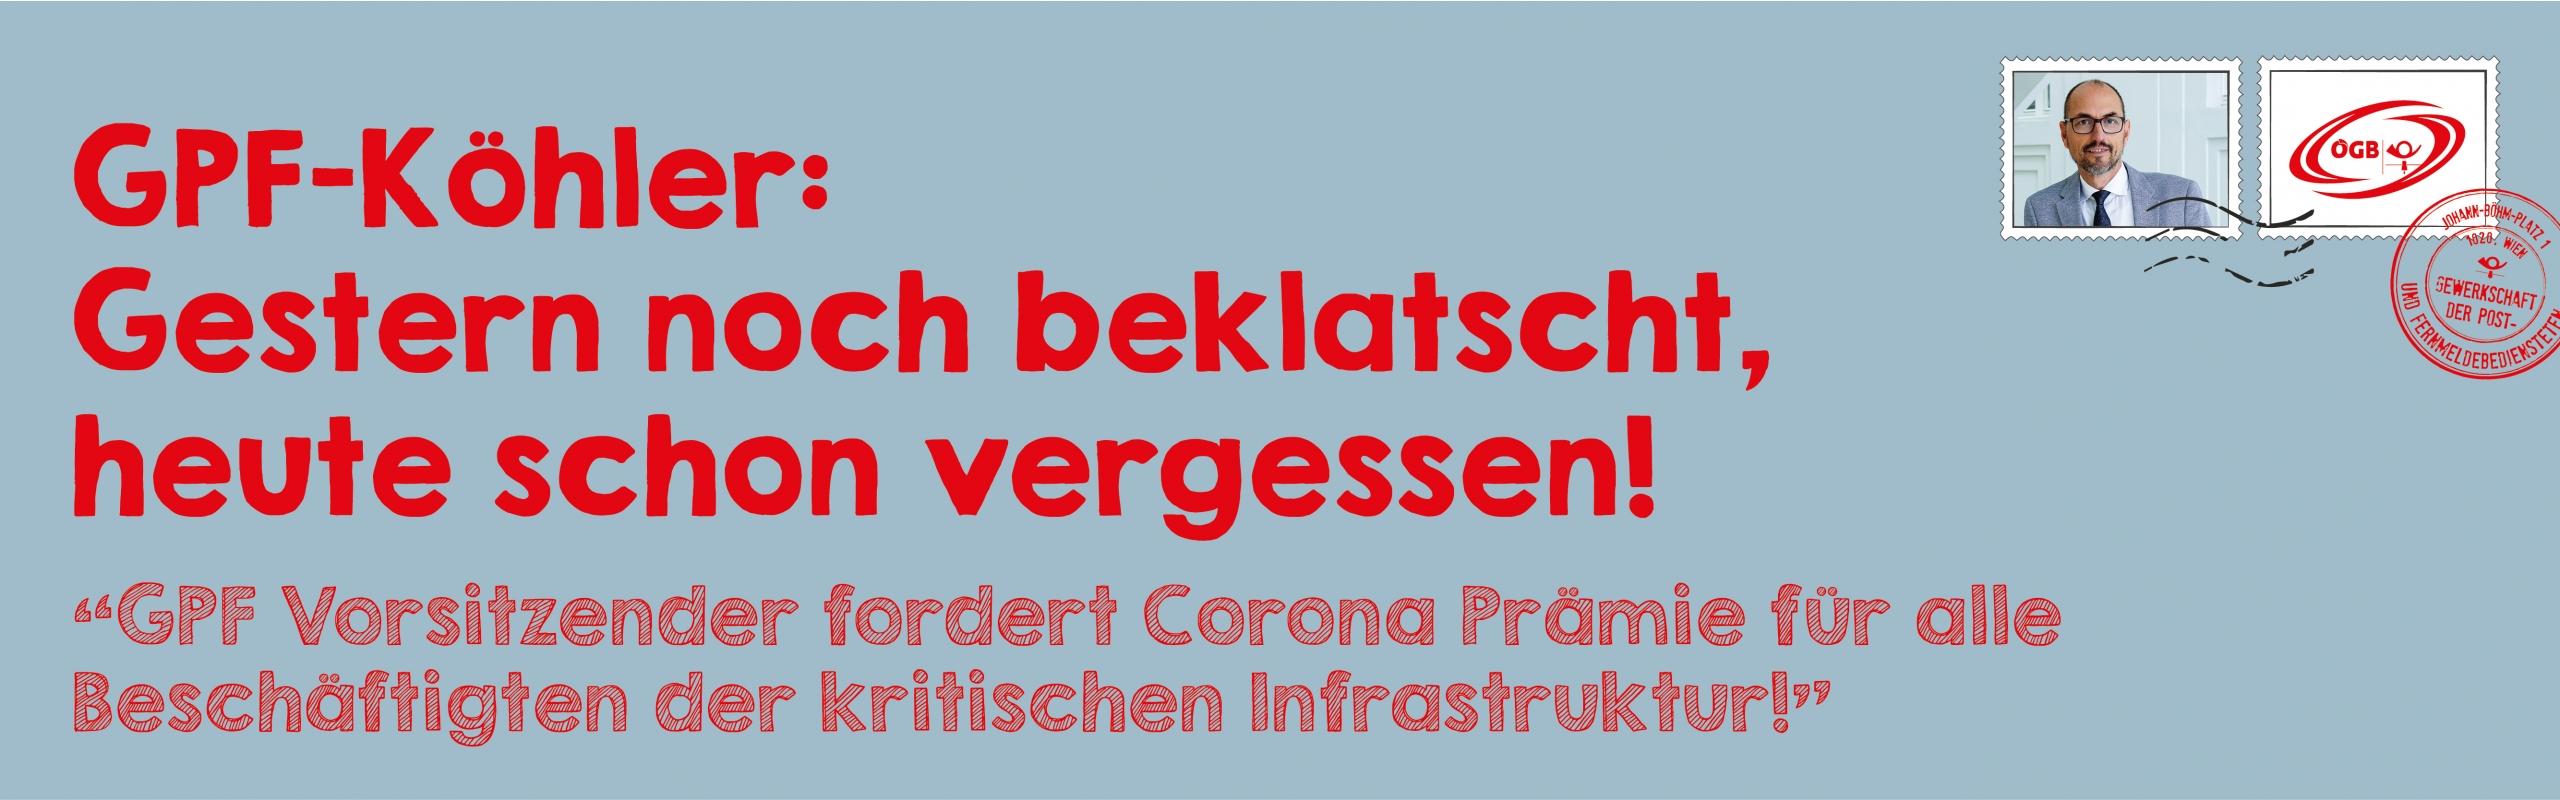 OTS Köhler_Gestern noch beklatscht, heute schon vergessen!_Banner